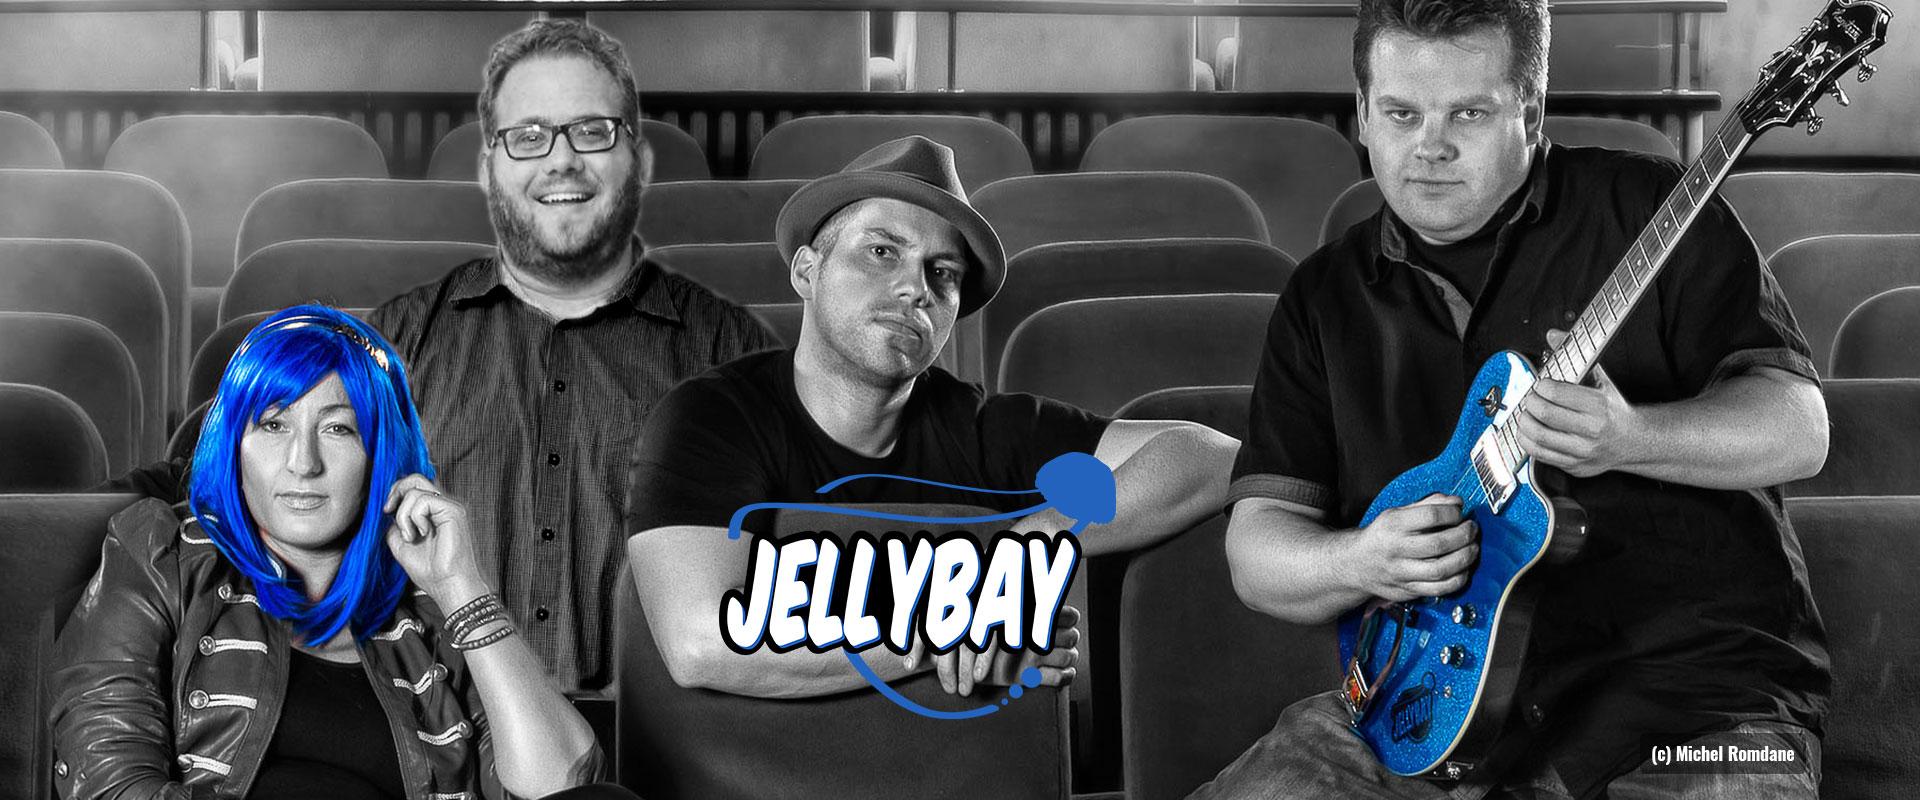 Jellybay